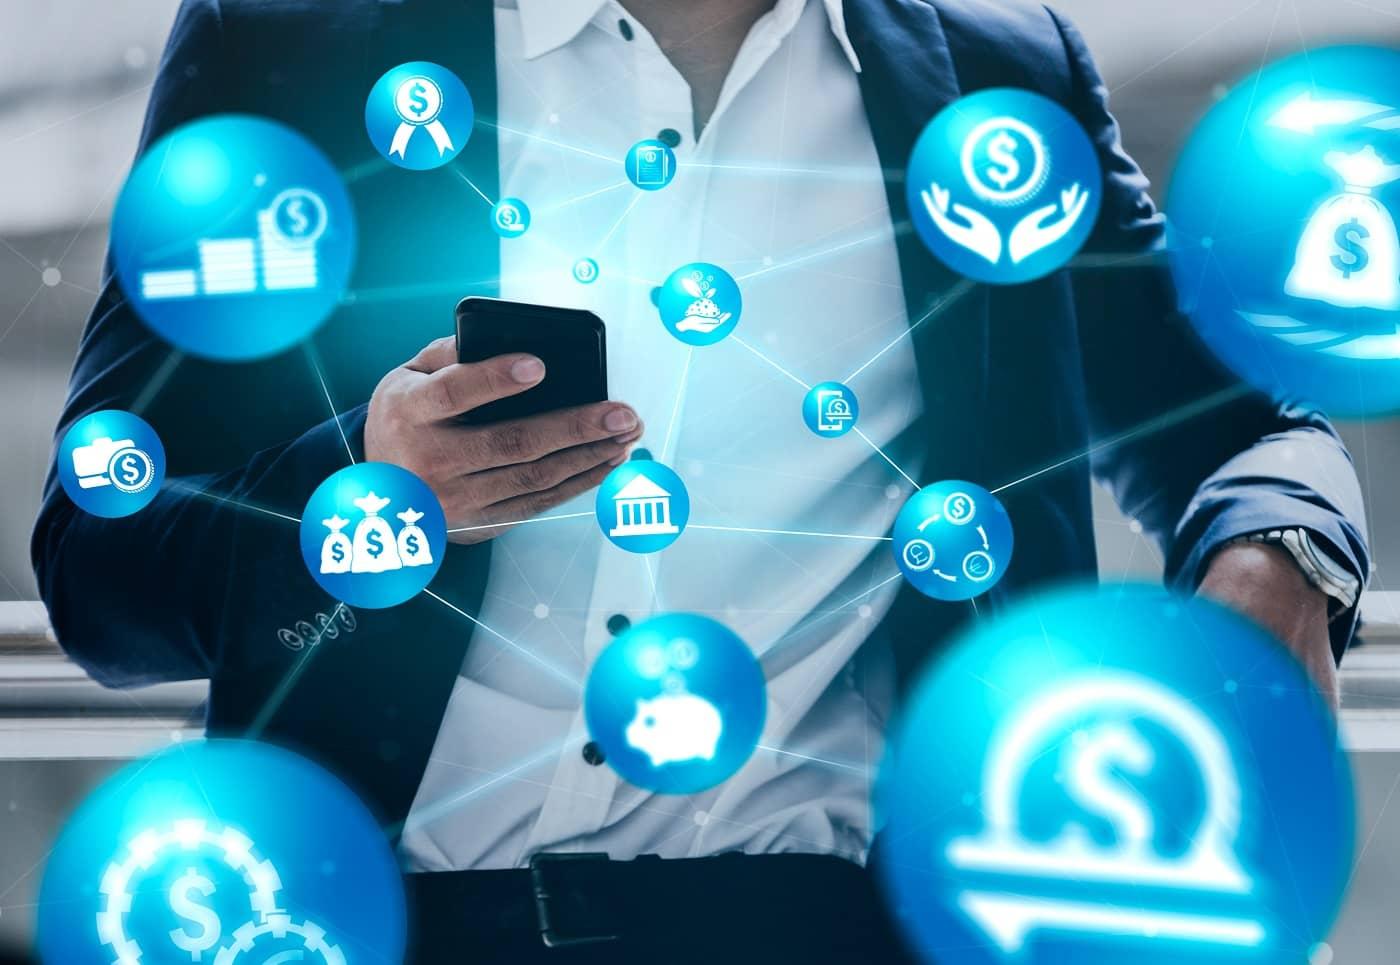 empresa y ética digital